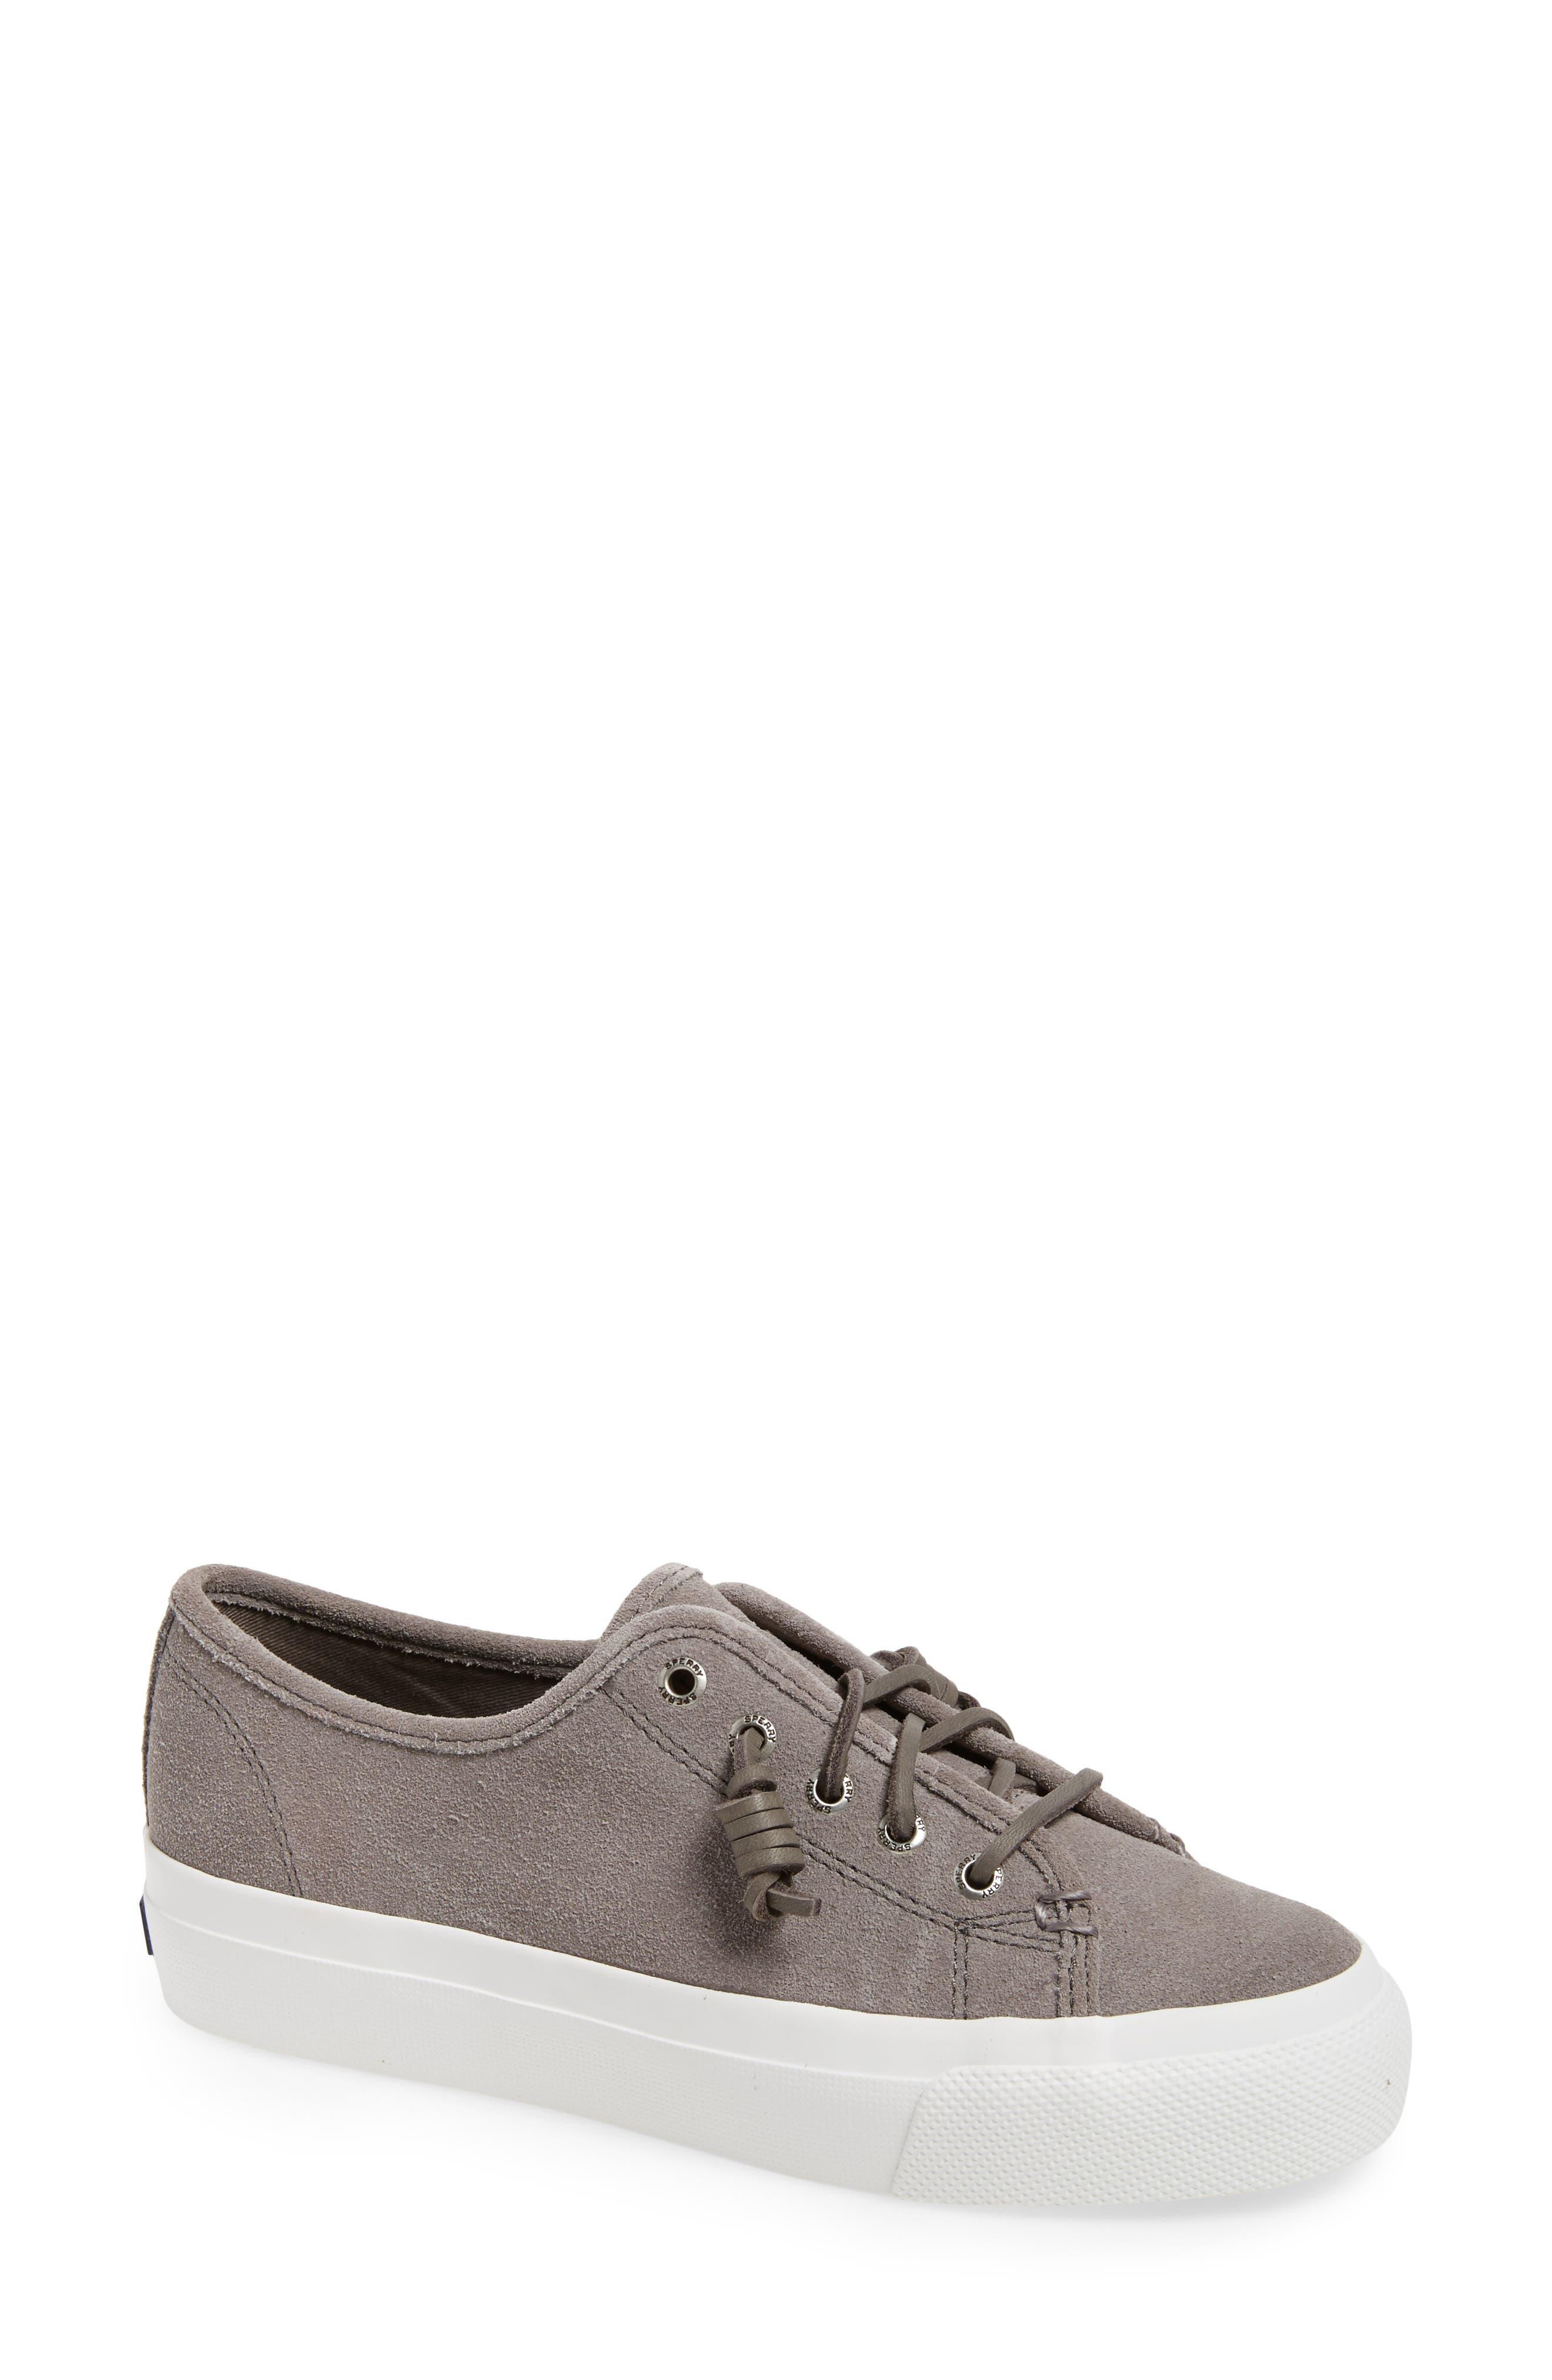 Sky Sail Platform Sneaker,                         Main,                         color, Driftwood Suede